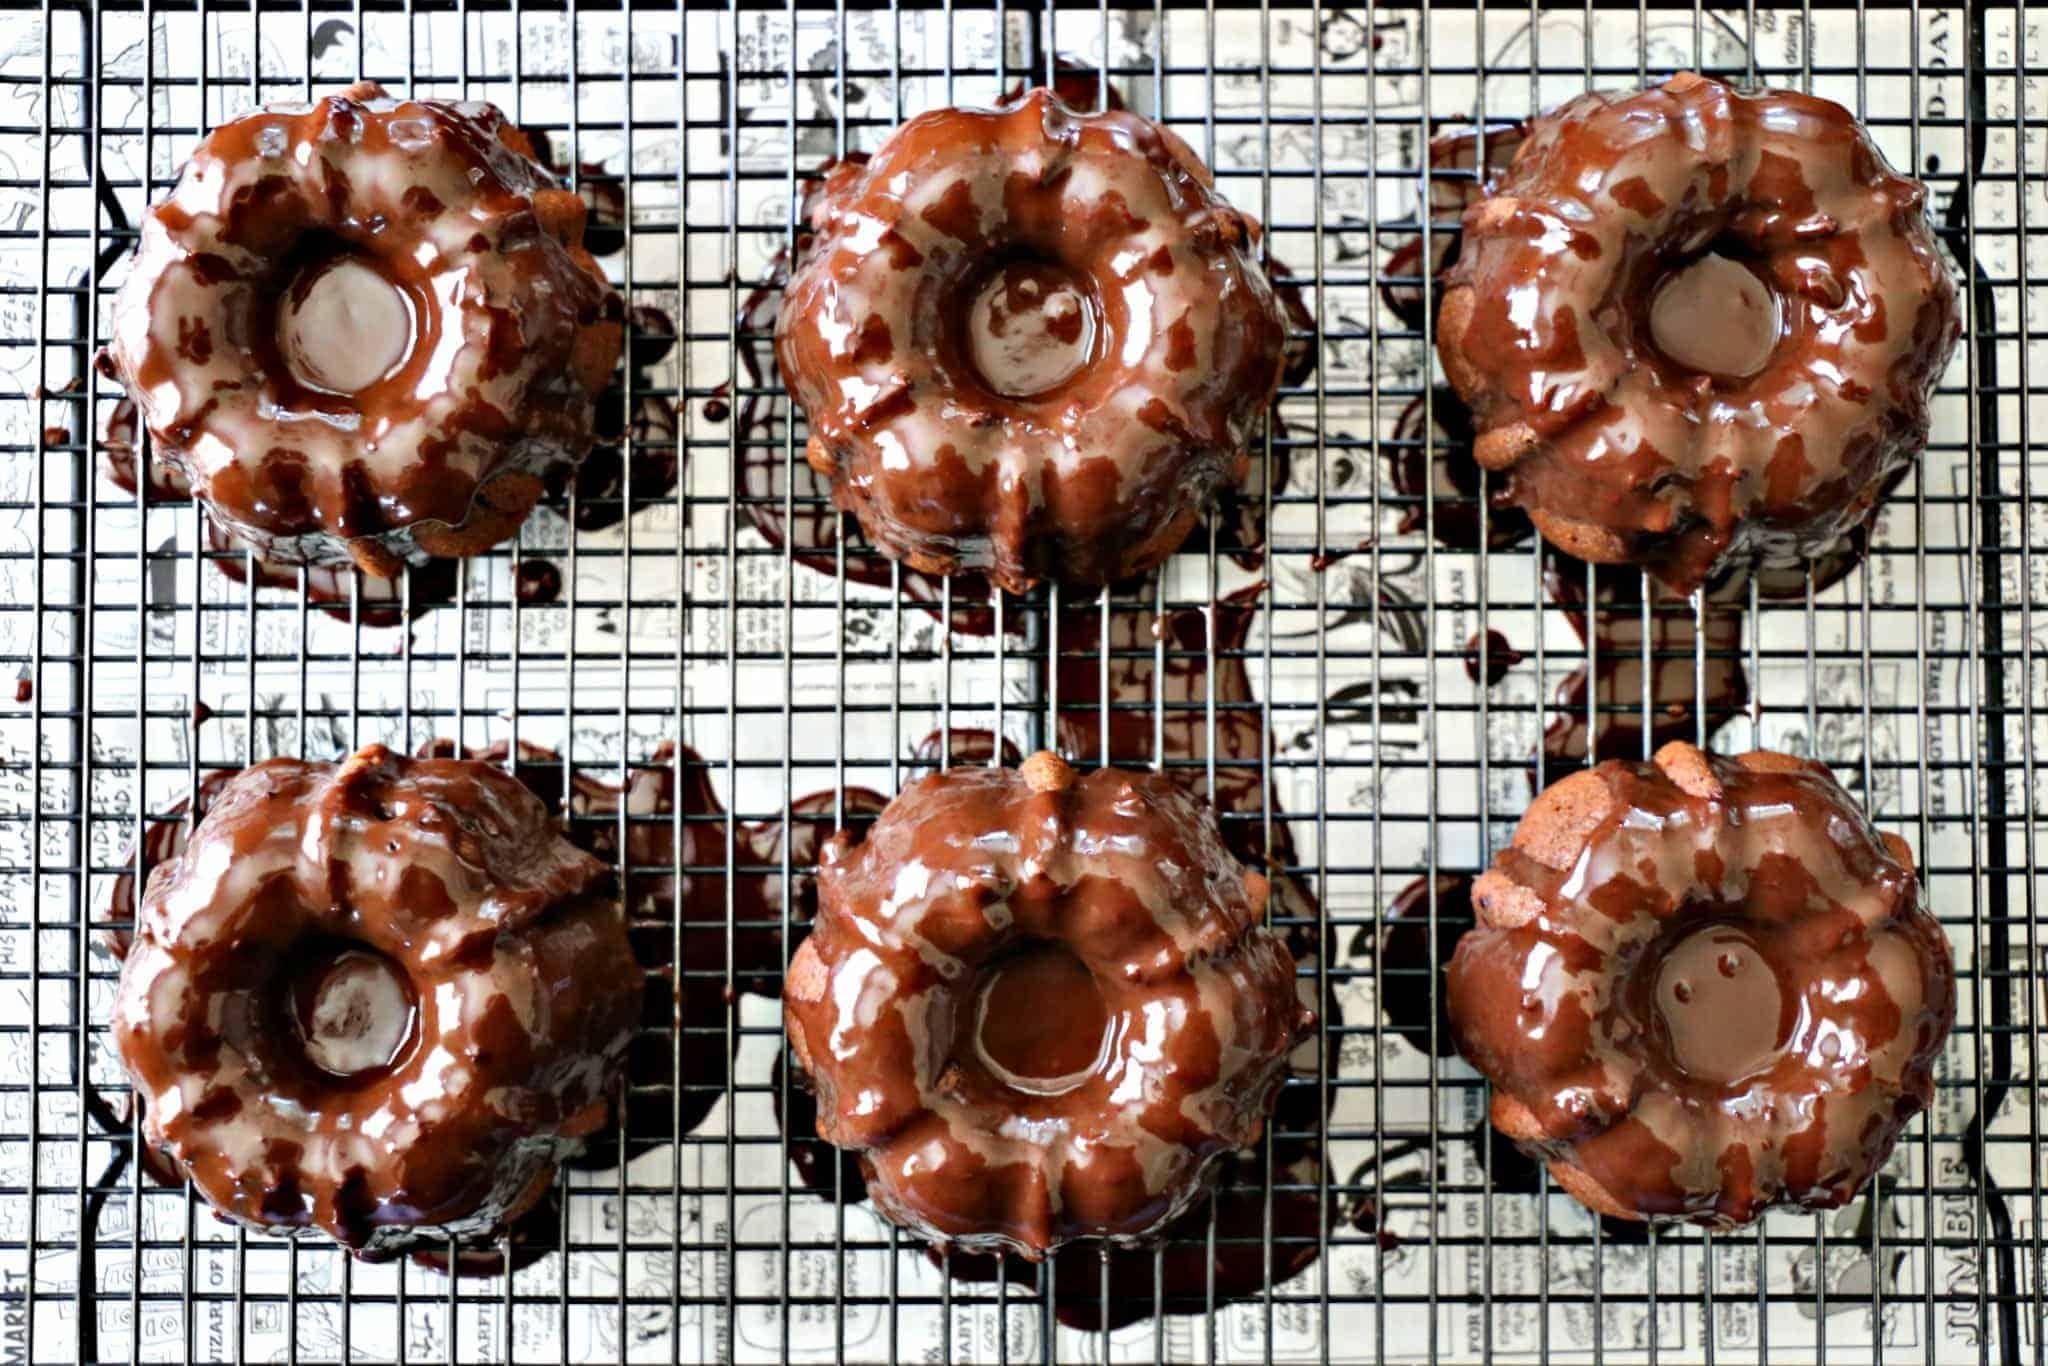 Glazed chocolate cakes